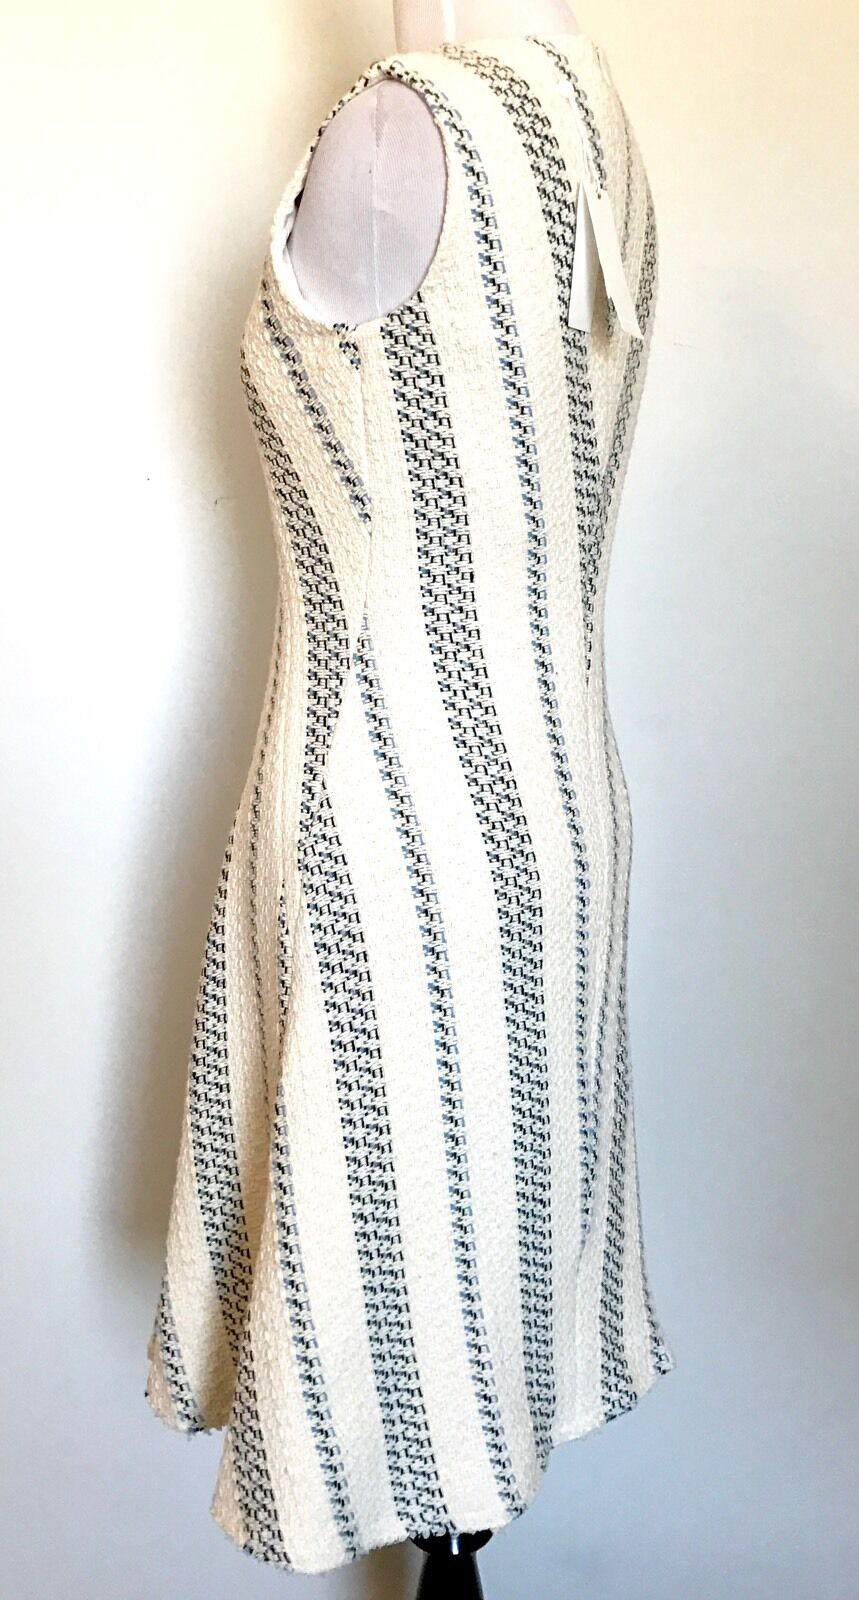 Tory Burch Cream Woven Stacey Dress. Dress. Dress. NWT Retail  425  Price  190 Size 2 0e4e6d